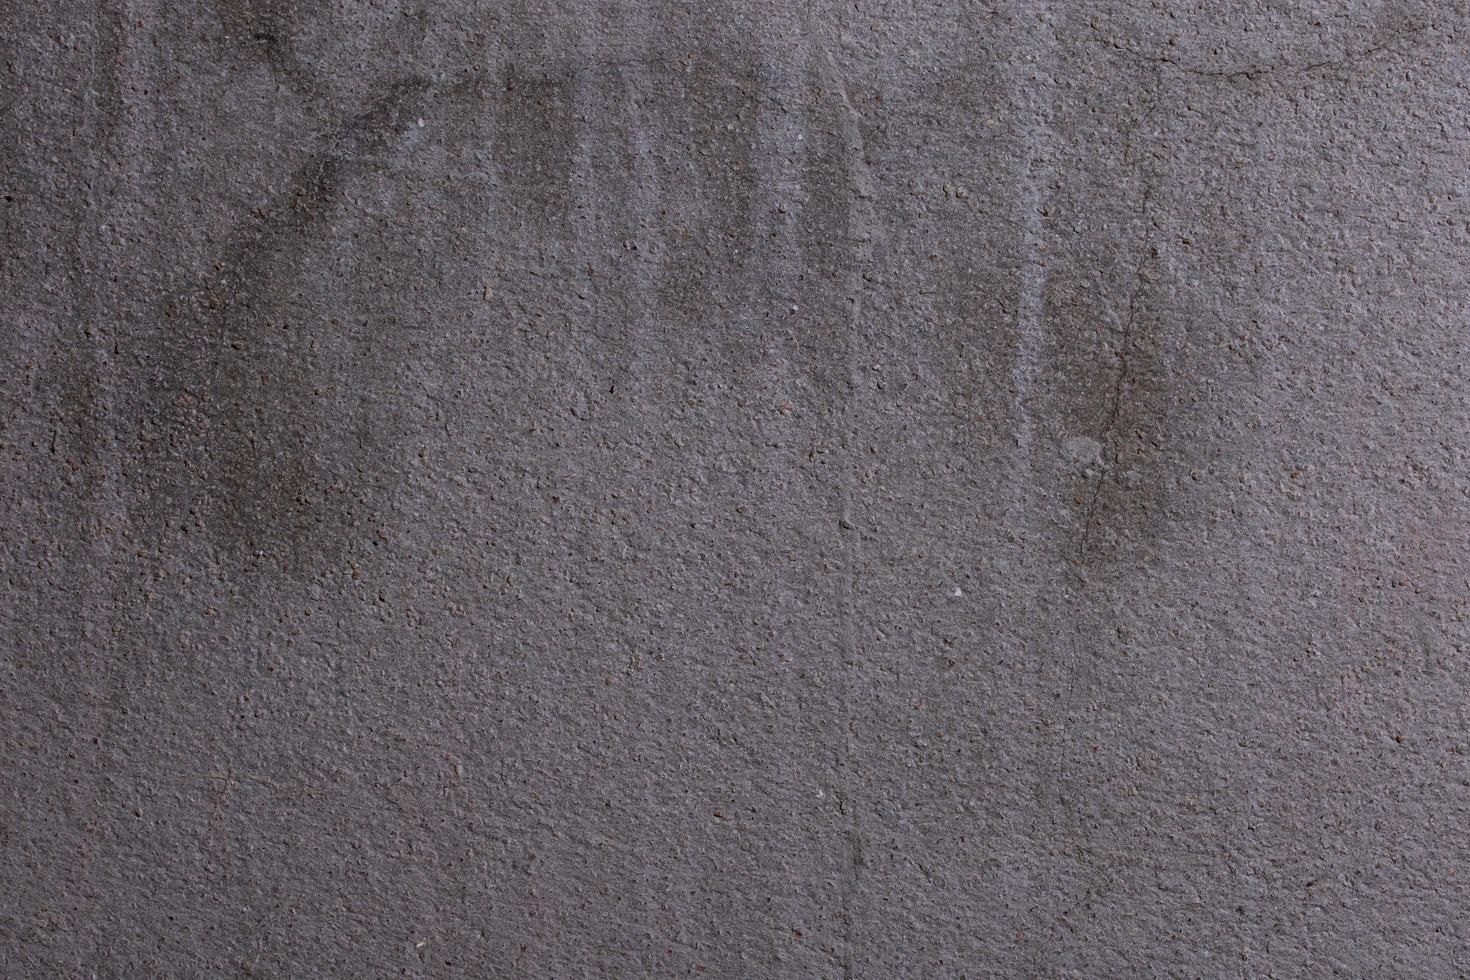 Grey cement floor background photo